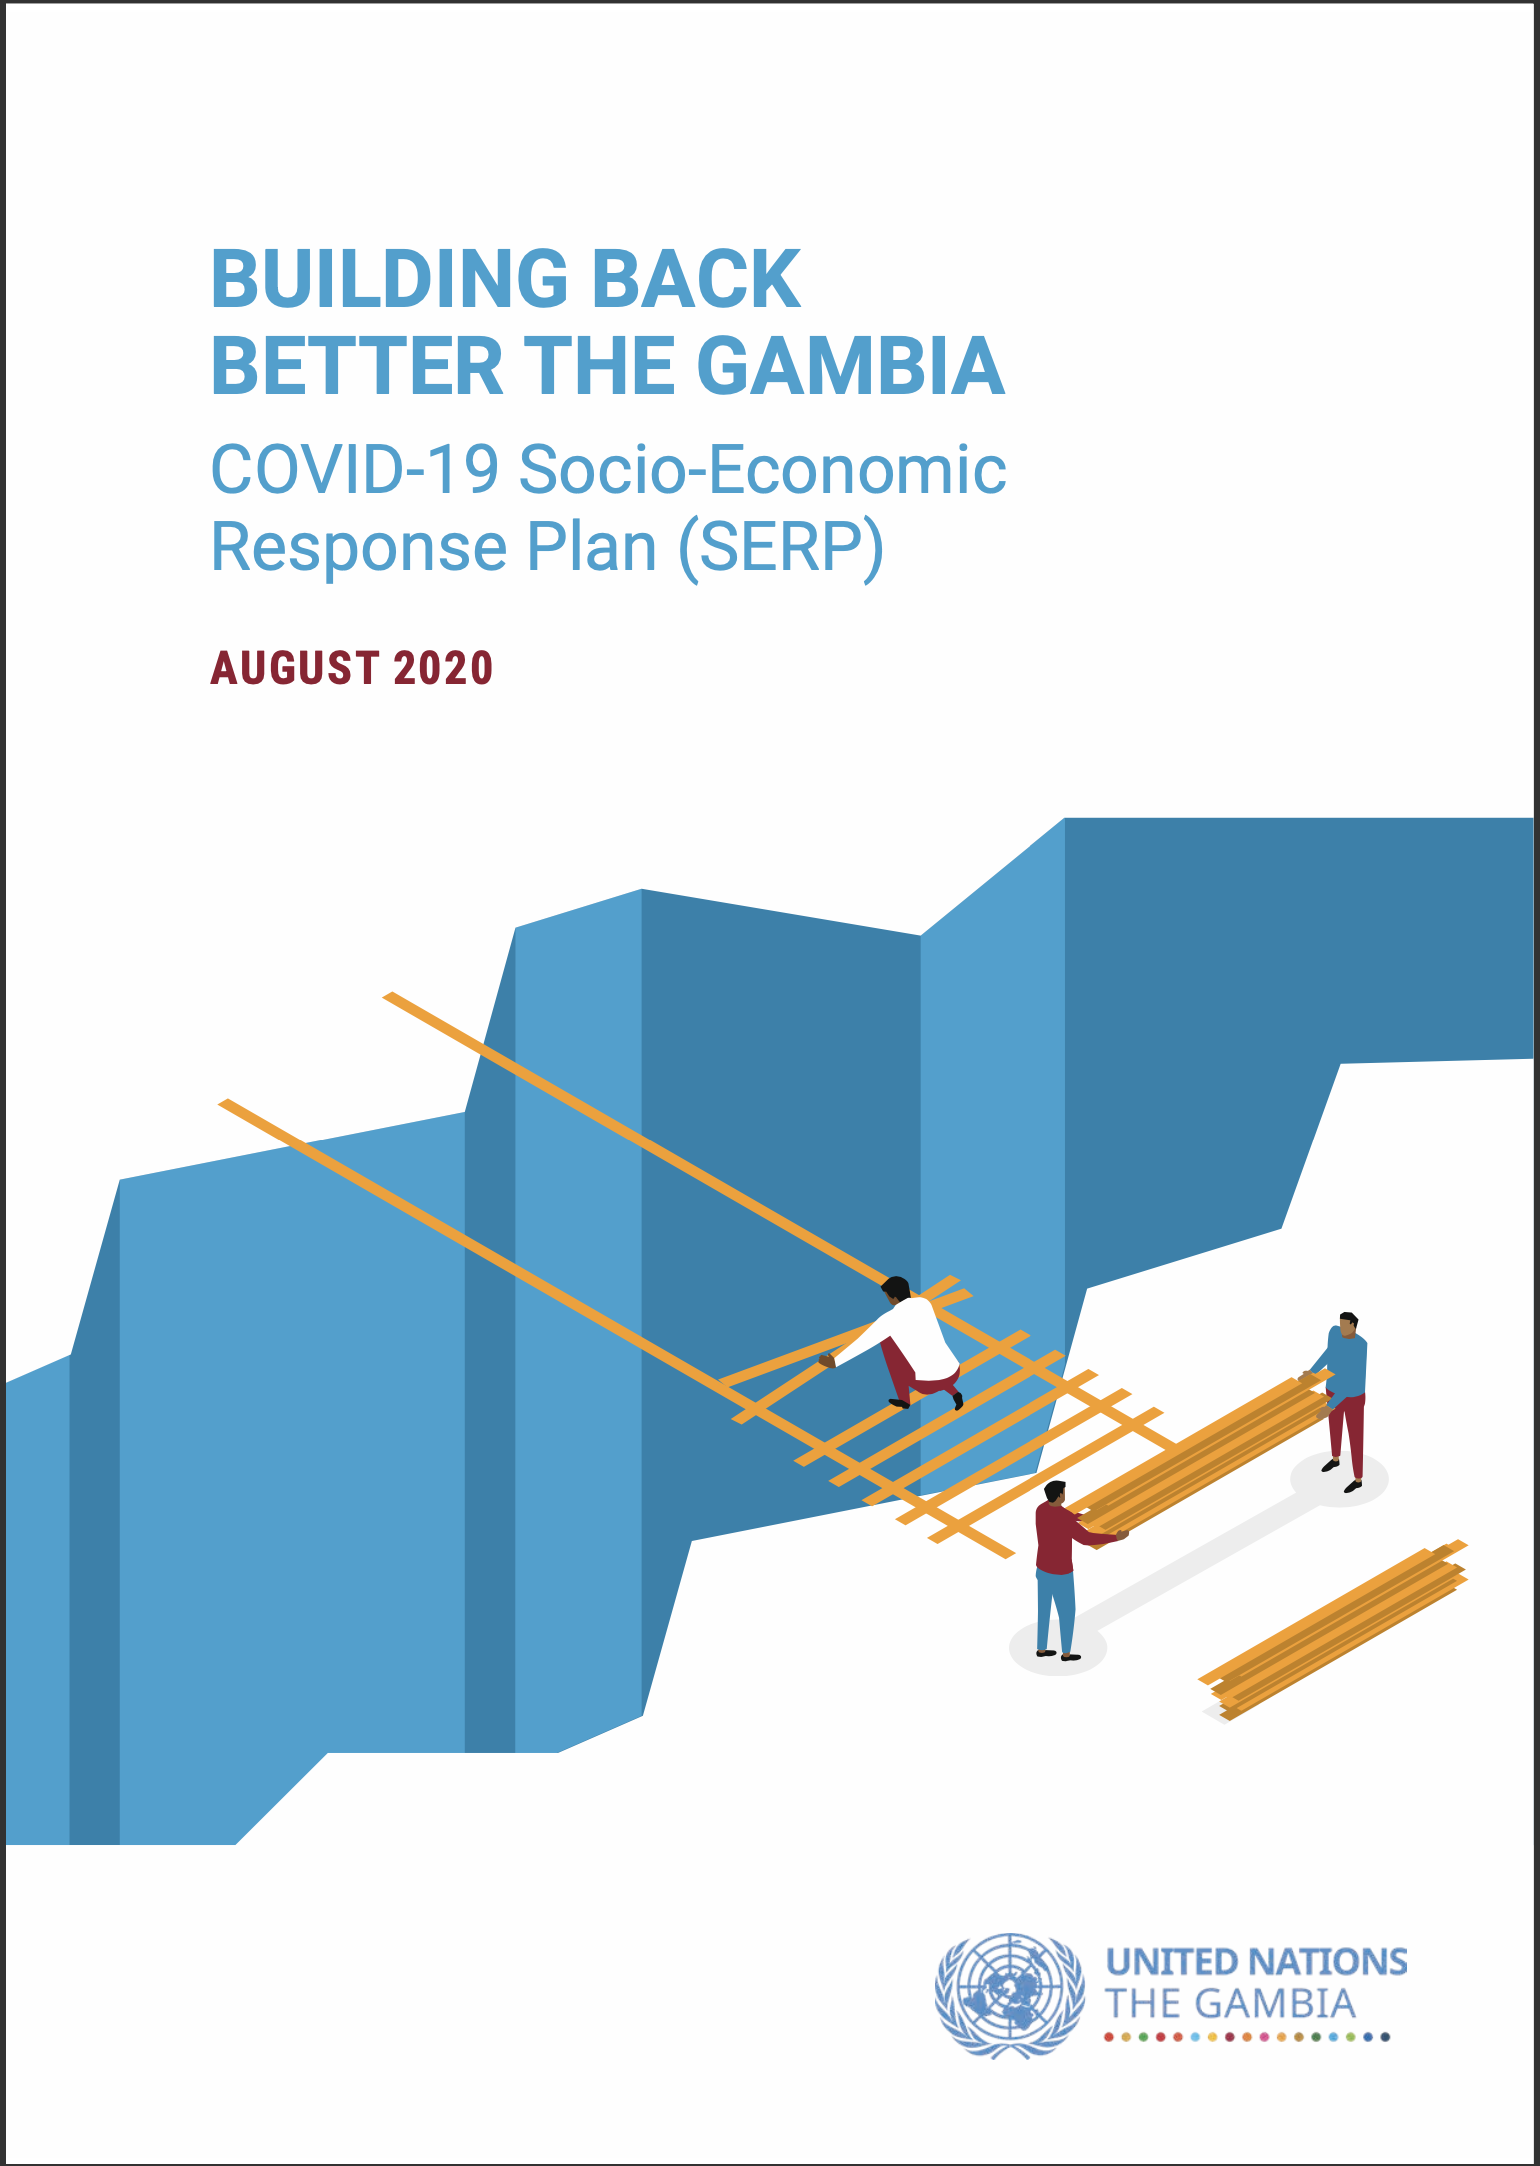 COVID-19 Socio-Economic Response Plan (SERP)